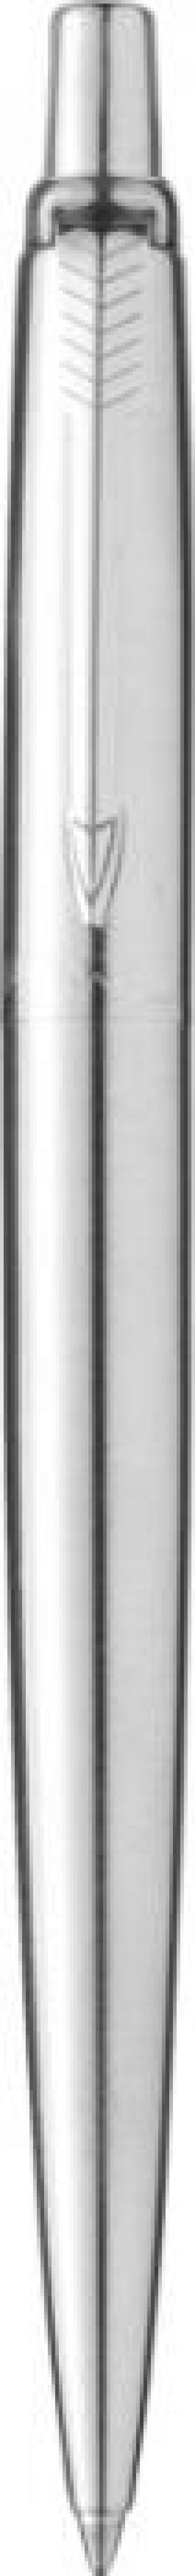 Bolígrafo Jotter cuerpo plata tinta negra